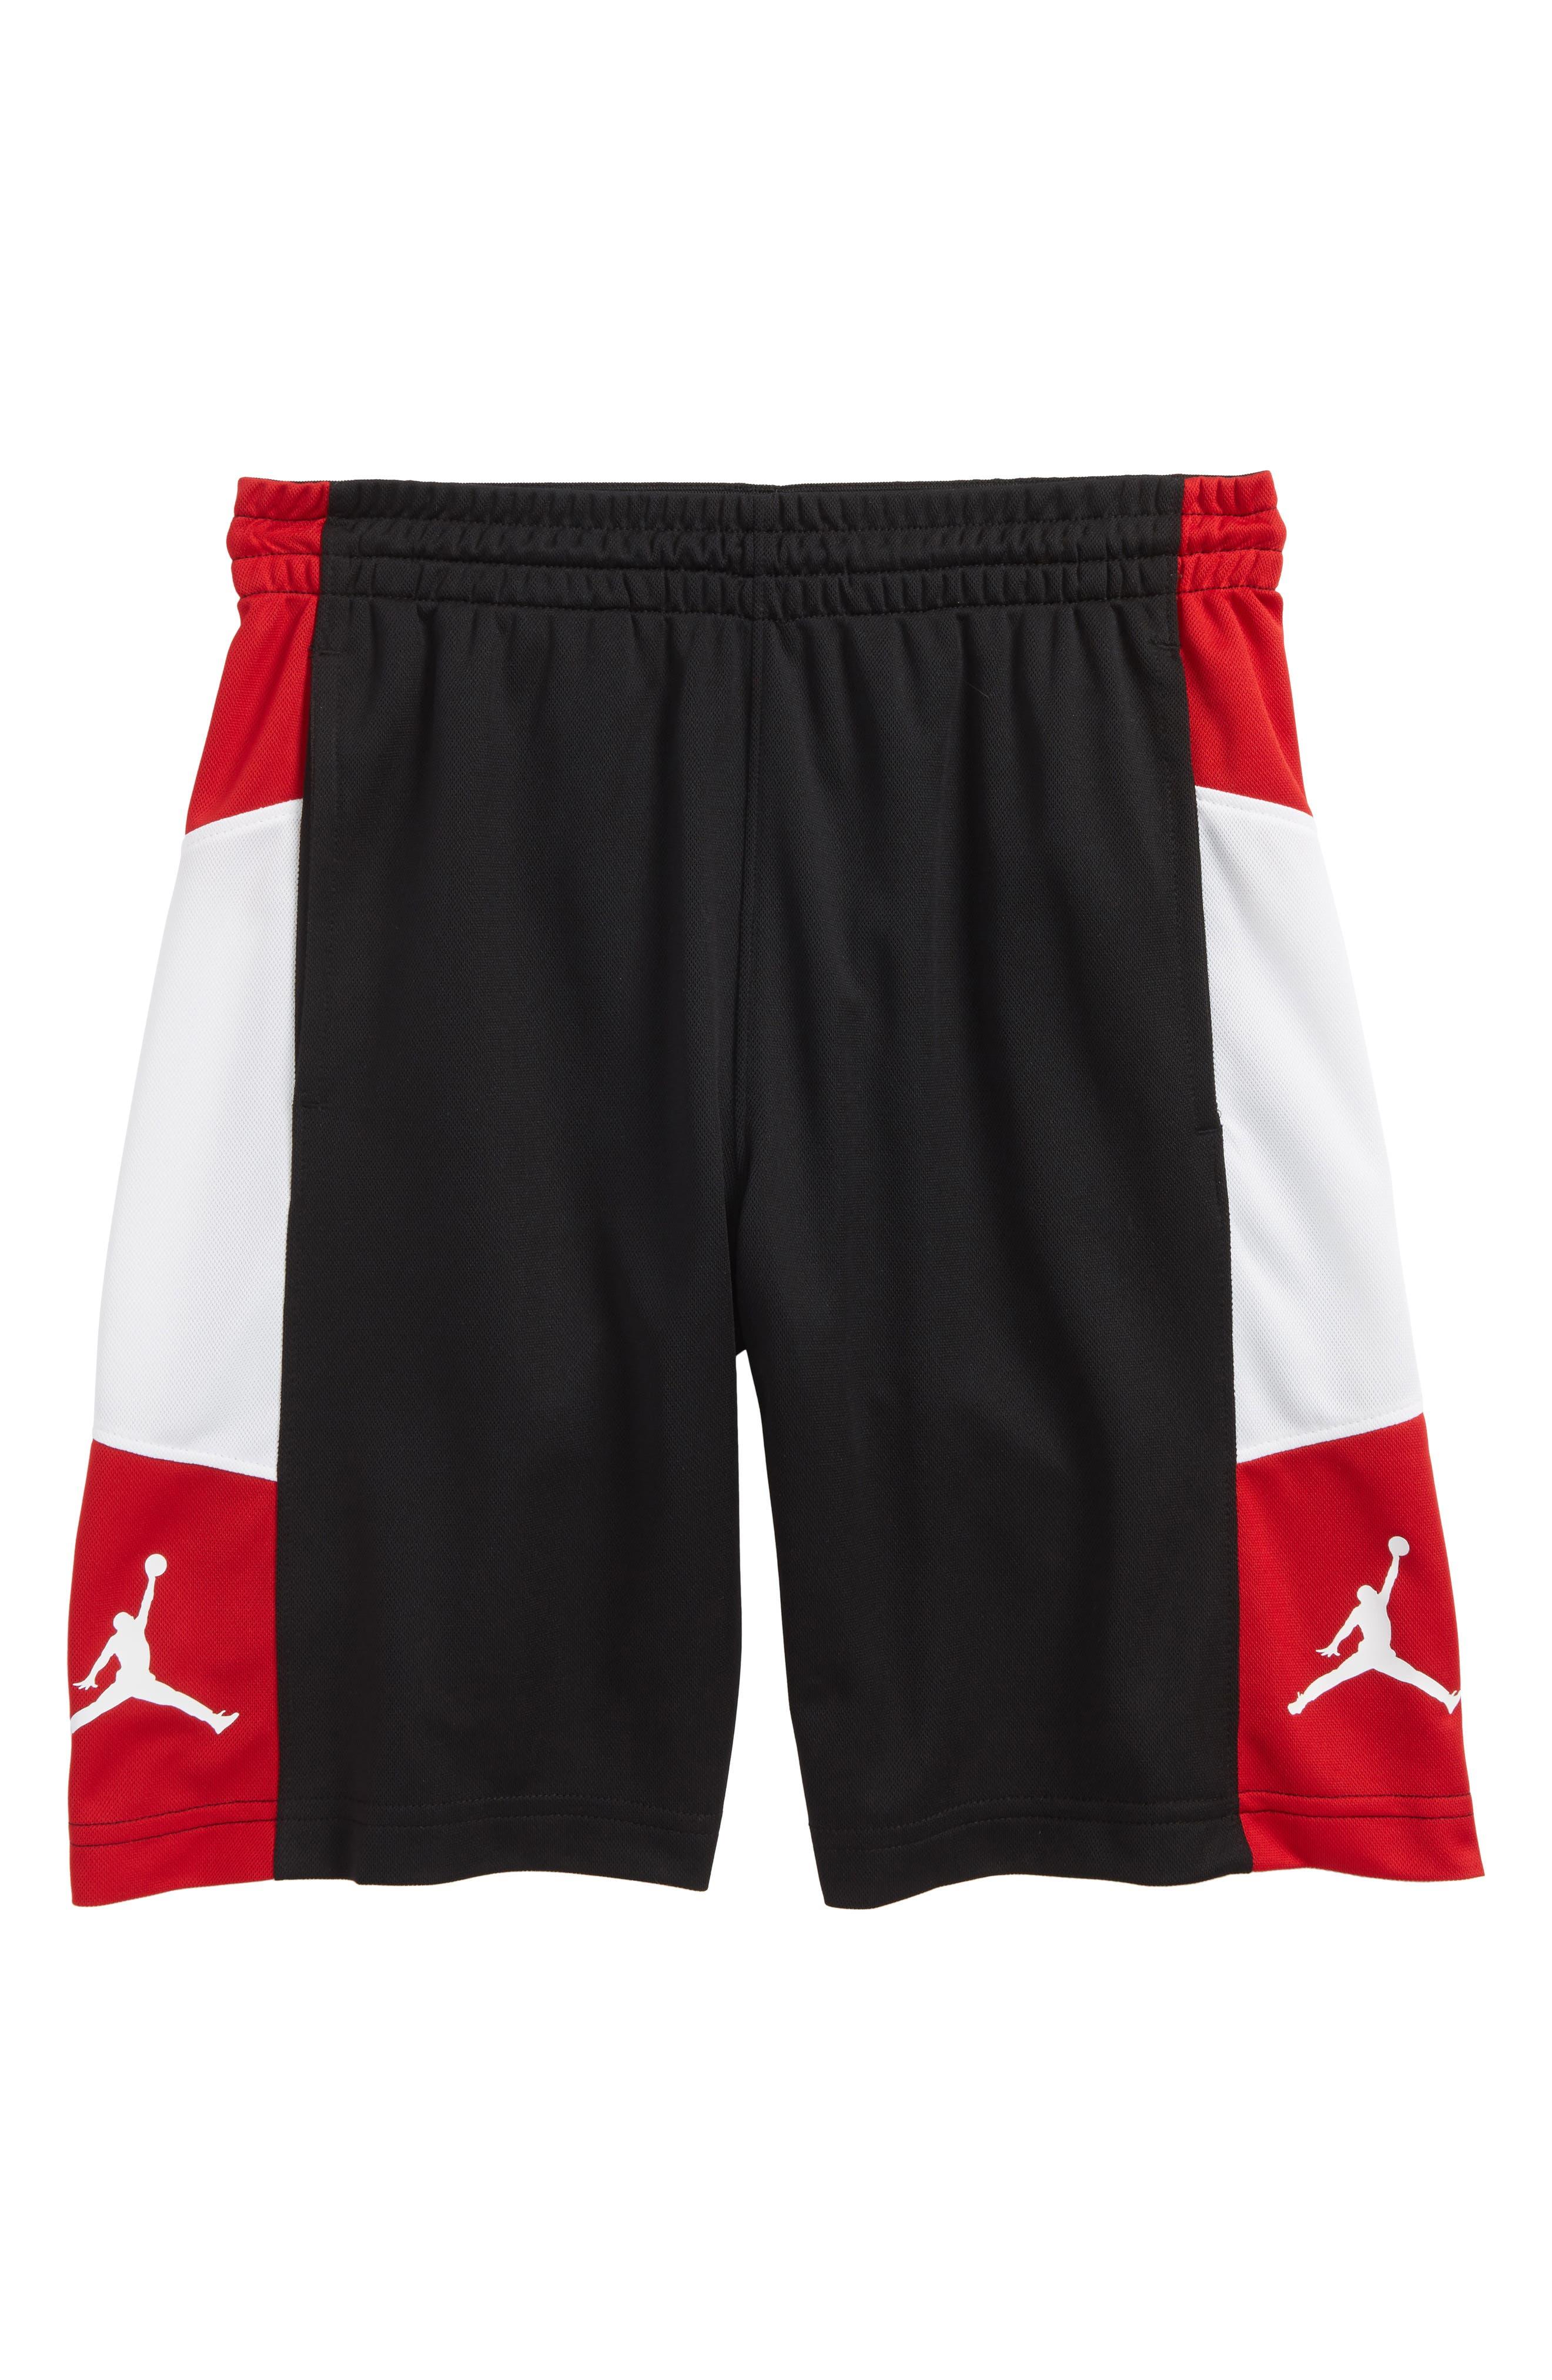 Jordan Elevate Shorts,                         Main,                         color, 004